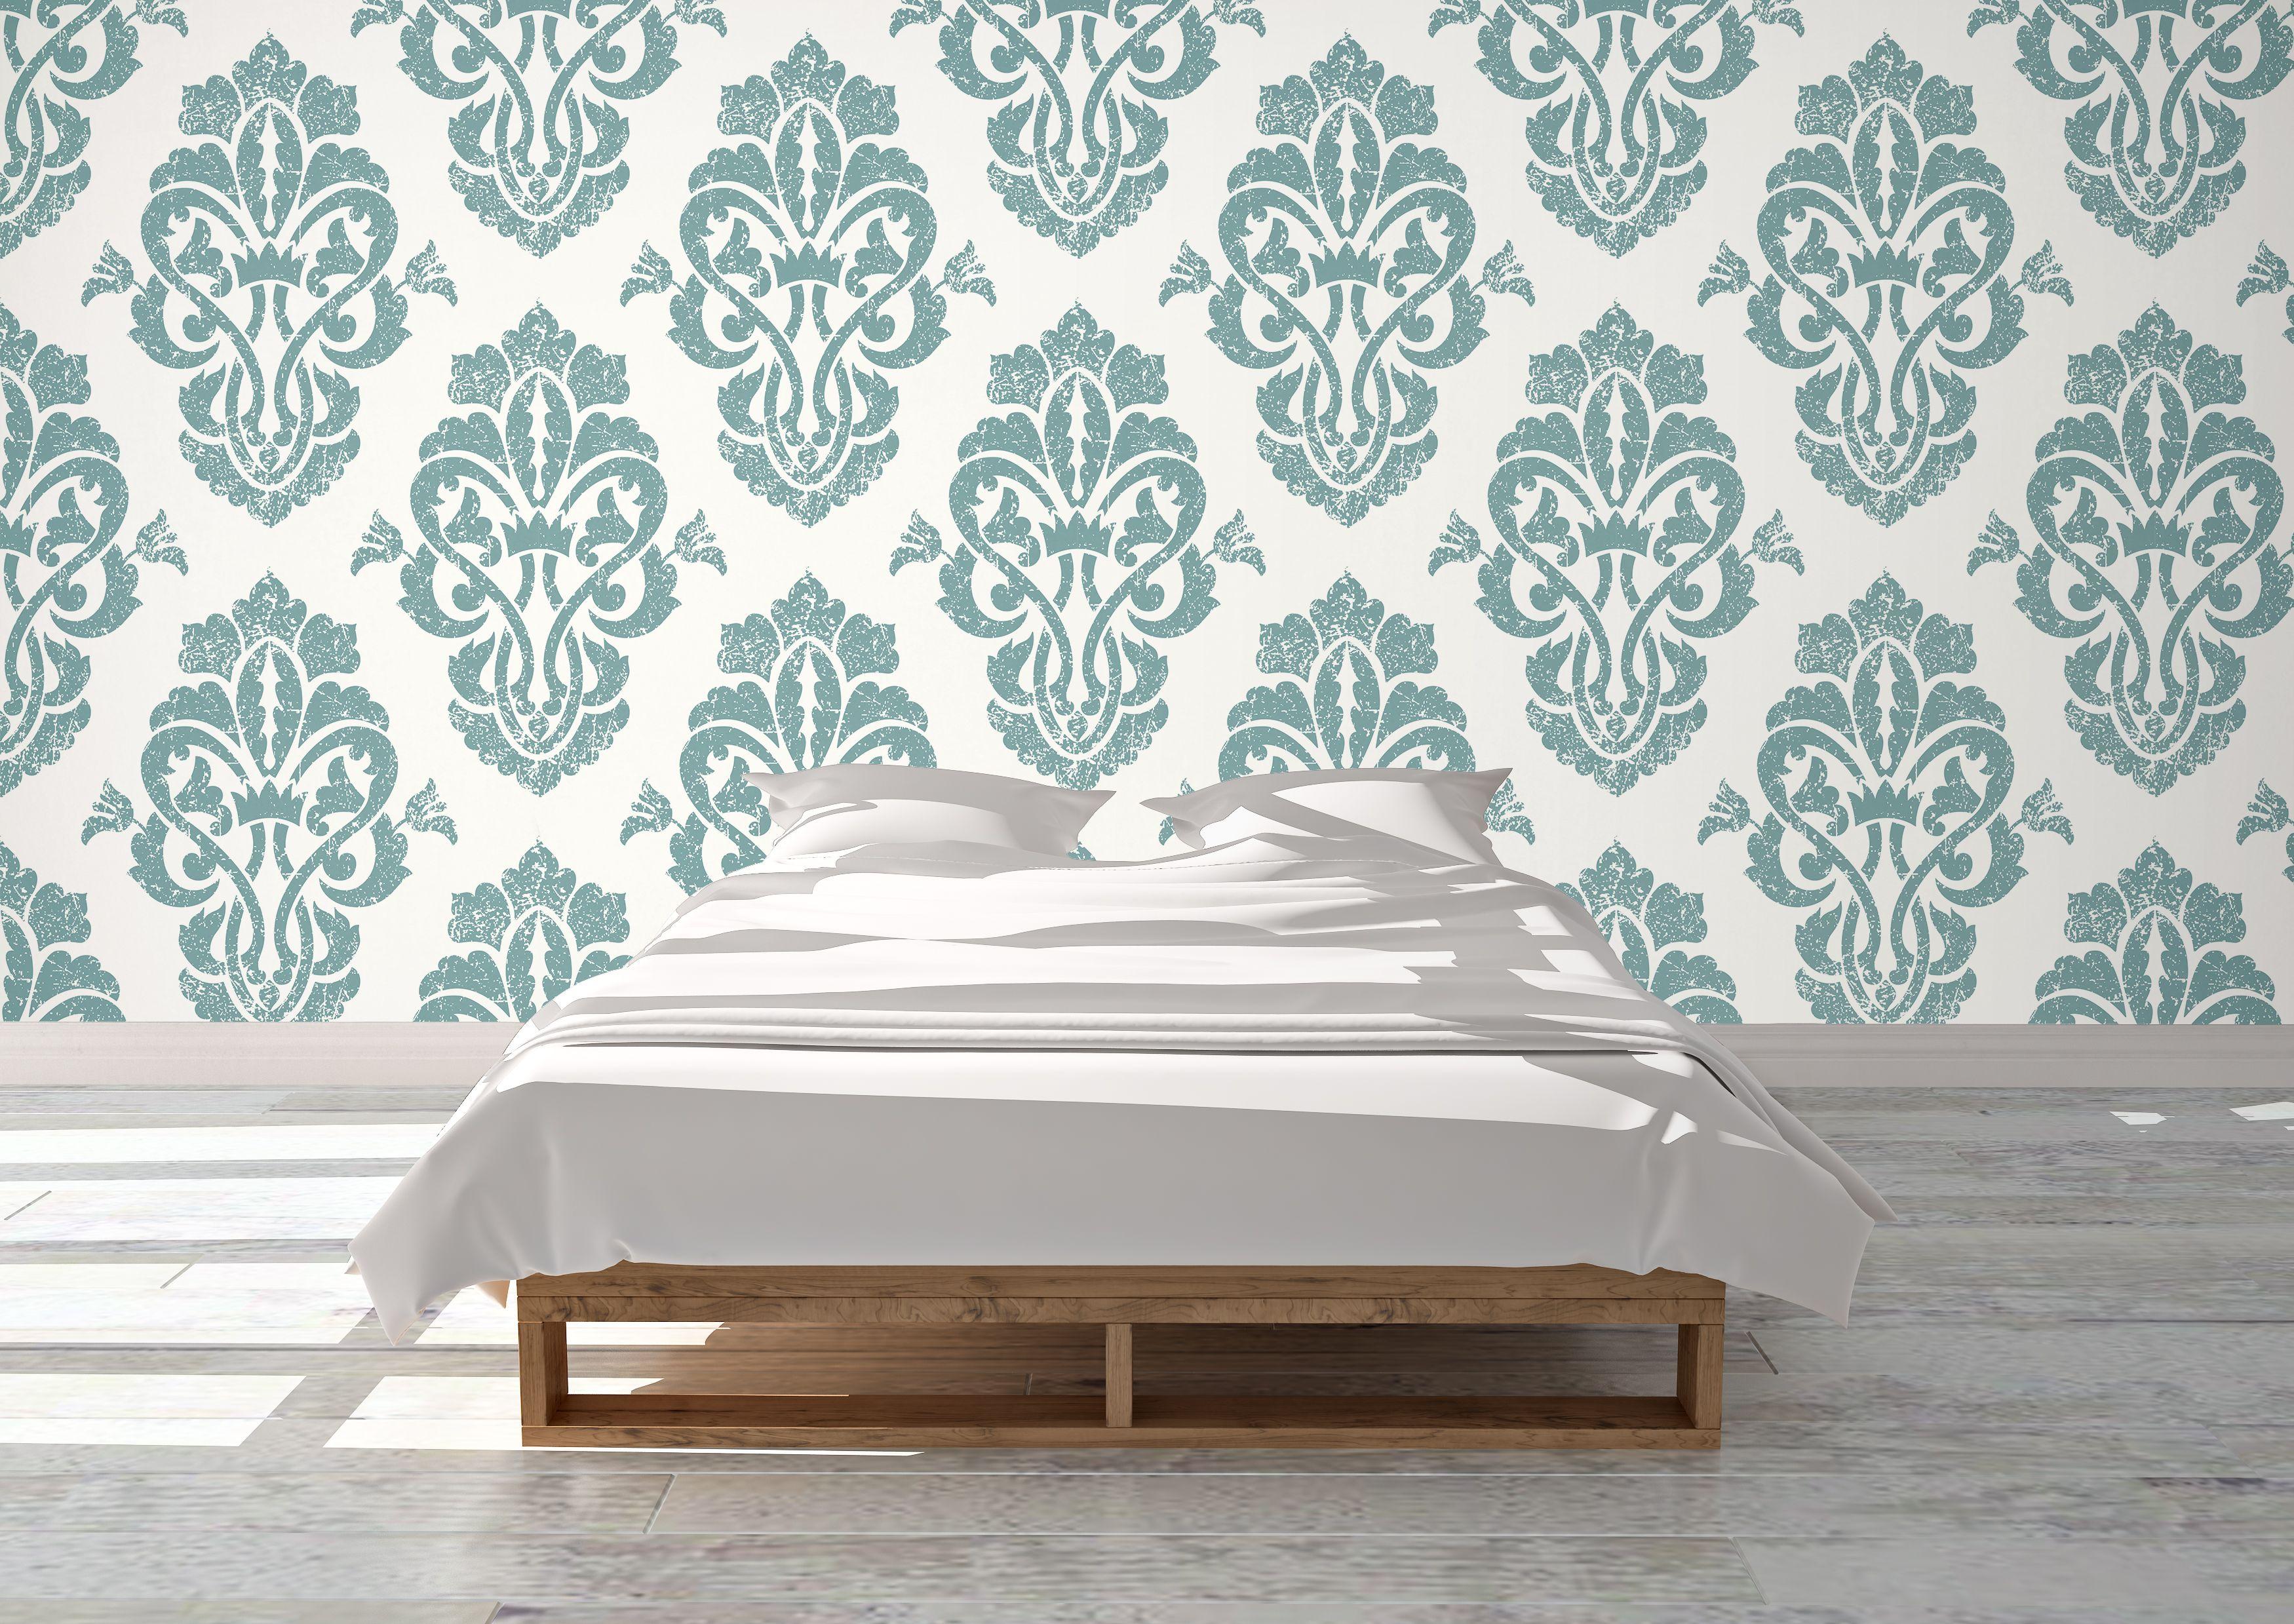 Self Adhesive Handmade Removable Wallpaper Home Decor Removable Wallpaper Wallpaper Decor